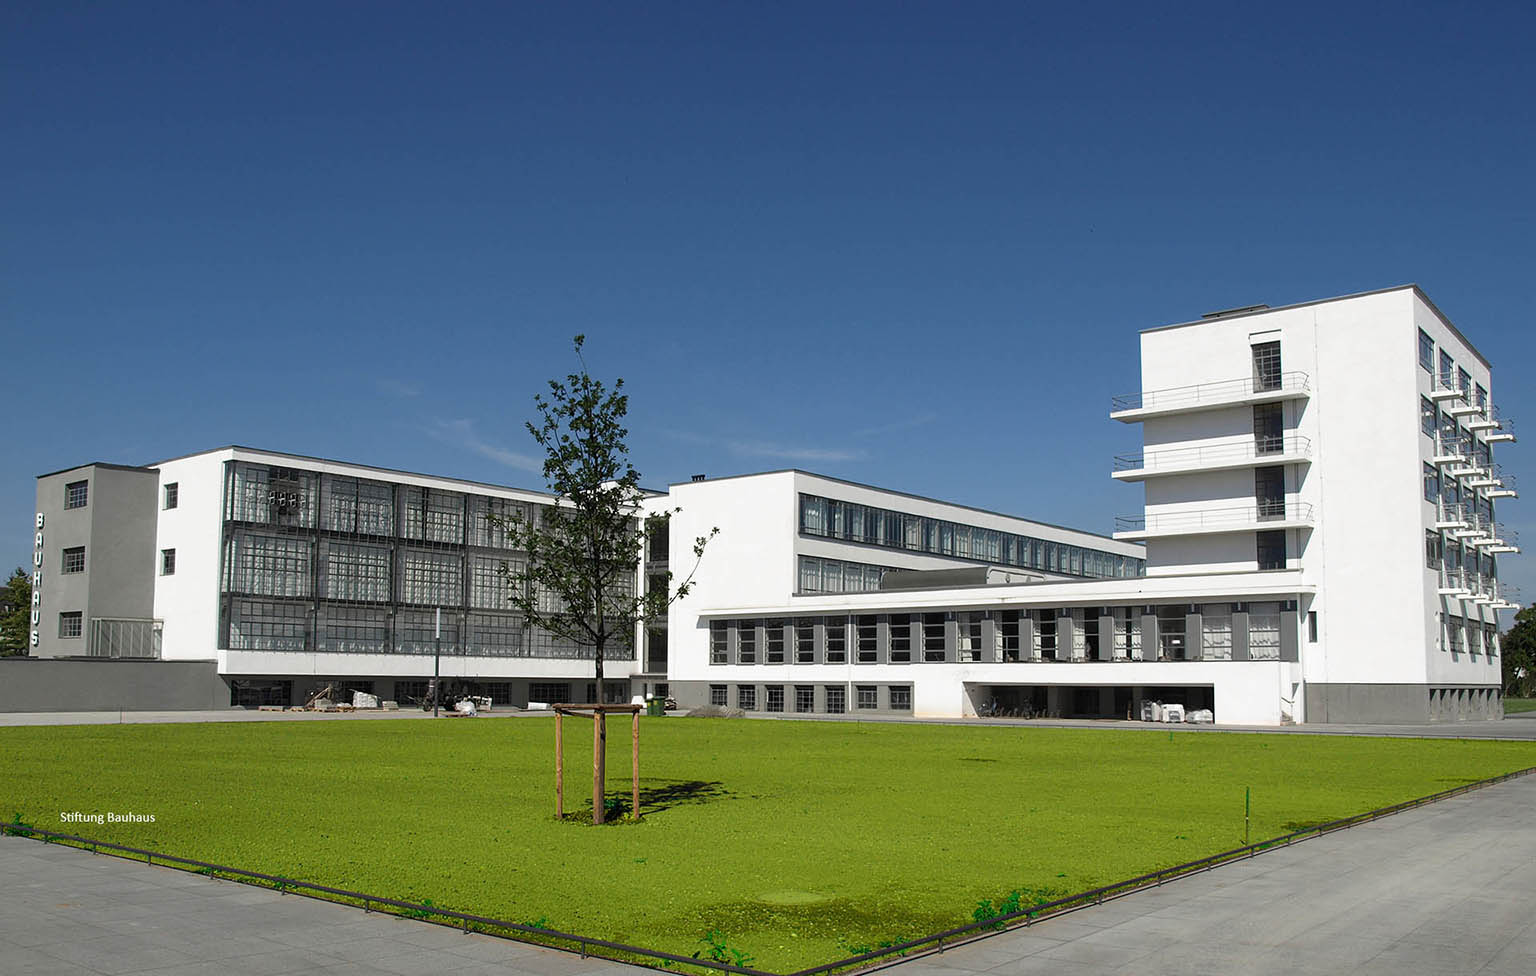 Bauhaus Dessau renovation with MHB classic-isos